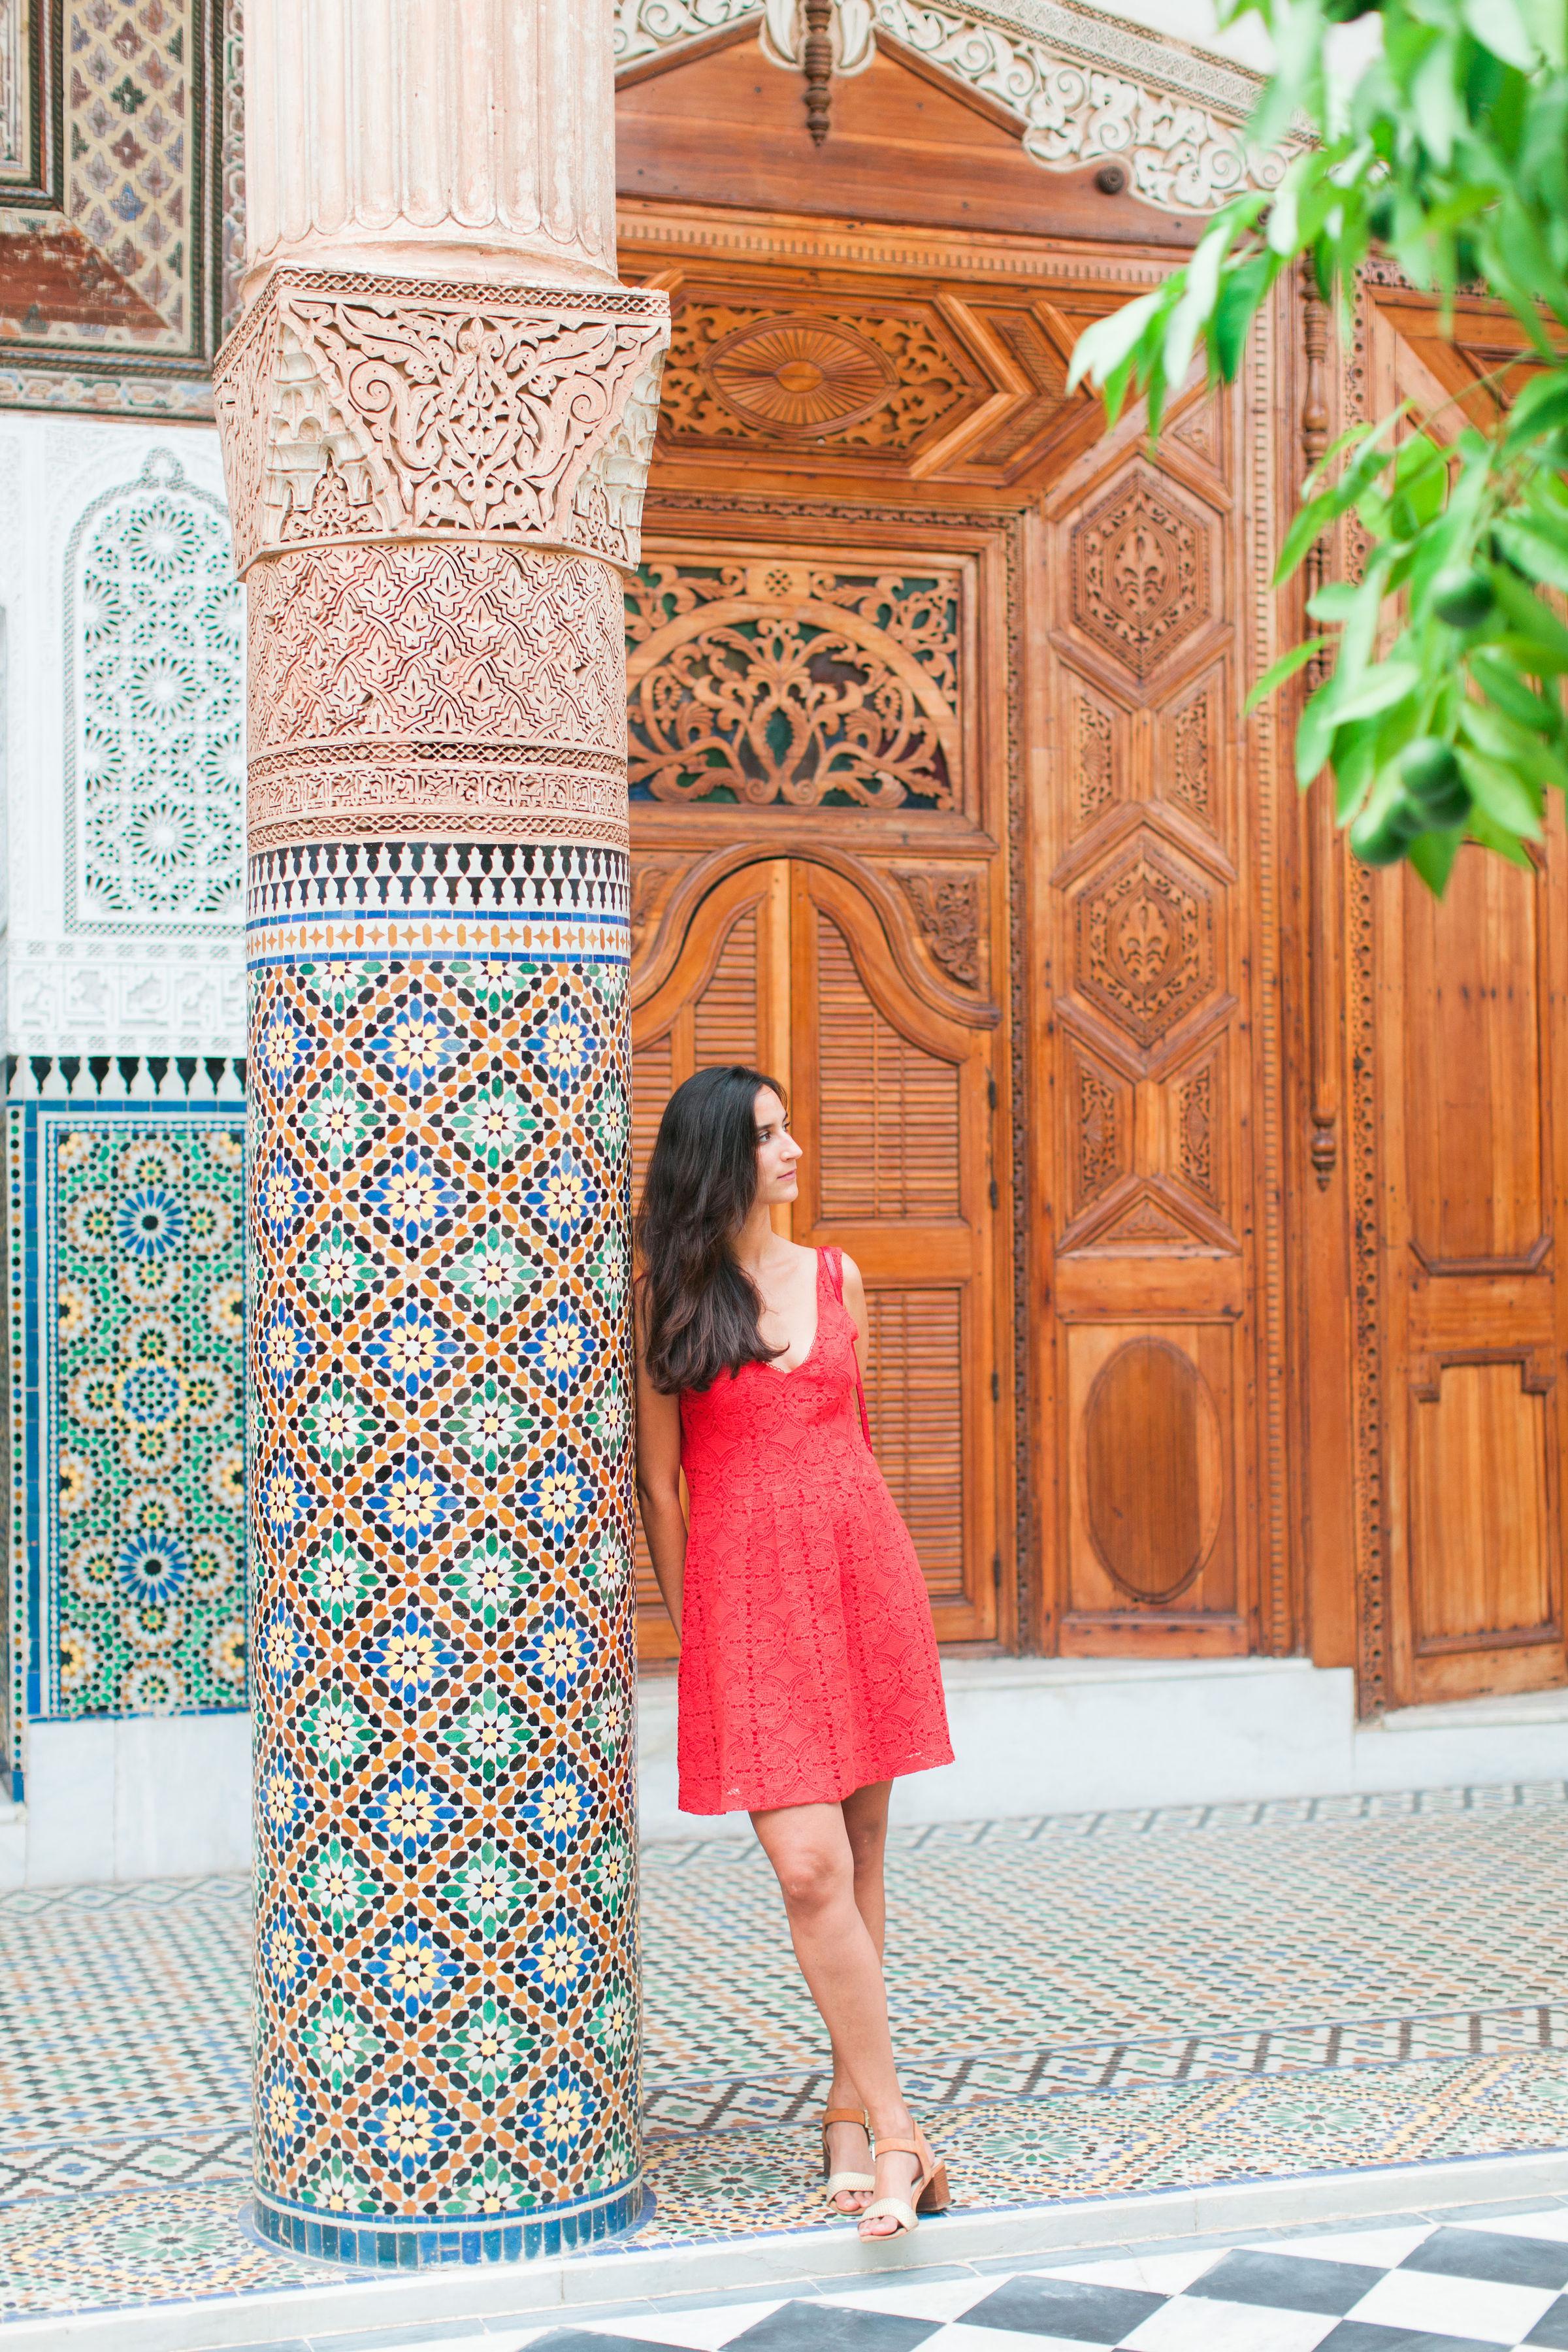 Dar-El-Bacha-Musée-Des-Confluences-Maria Rao Photography-IMG_4942.jpg